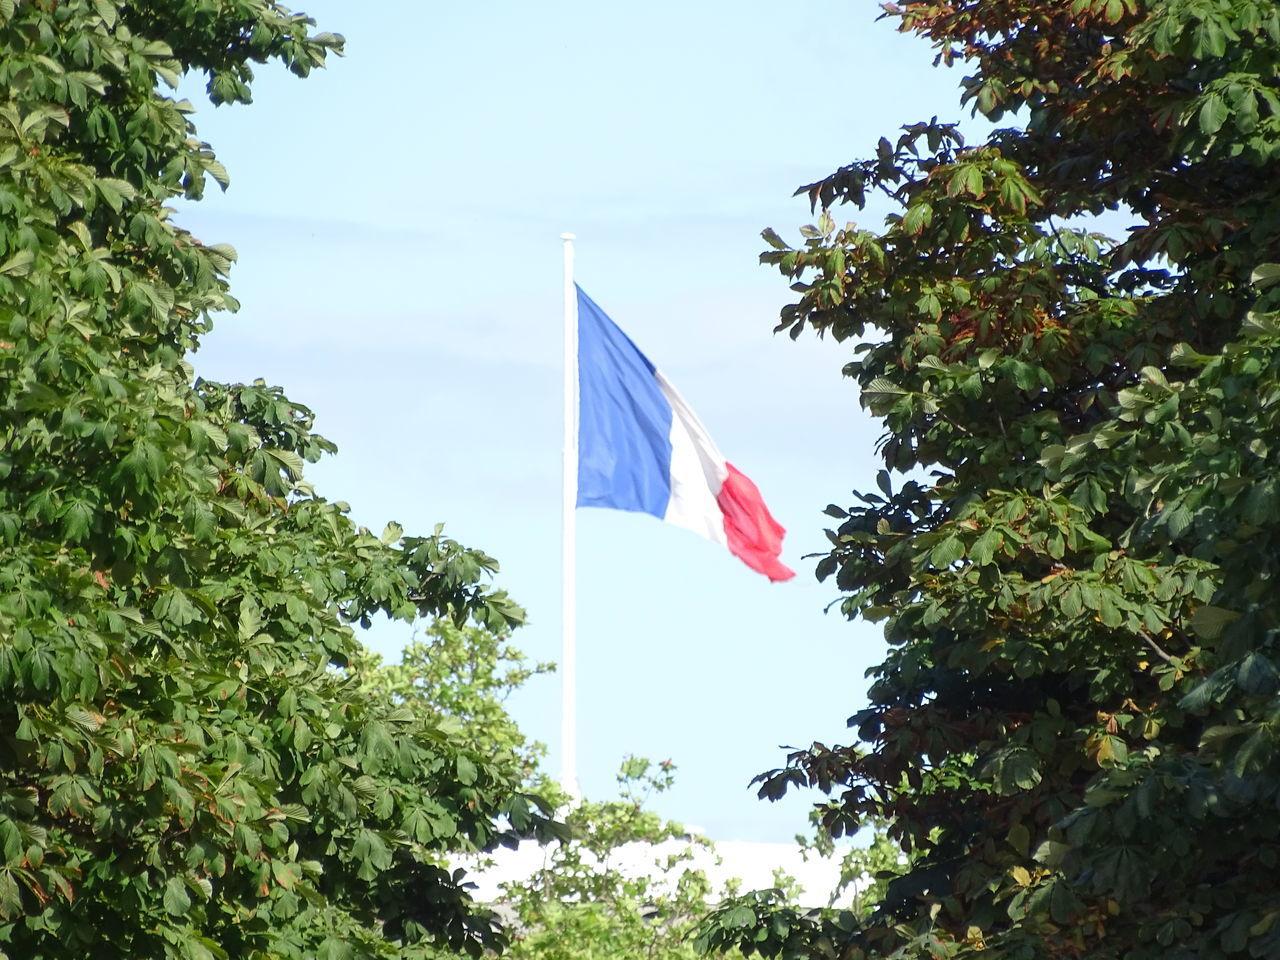 Bleu Blanc Rouge Drapeau Drapeau Bleu Blanc Rouge Flag French Flag Patriotism Sky Tree Waving